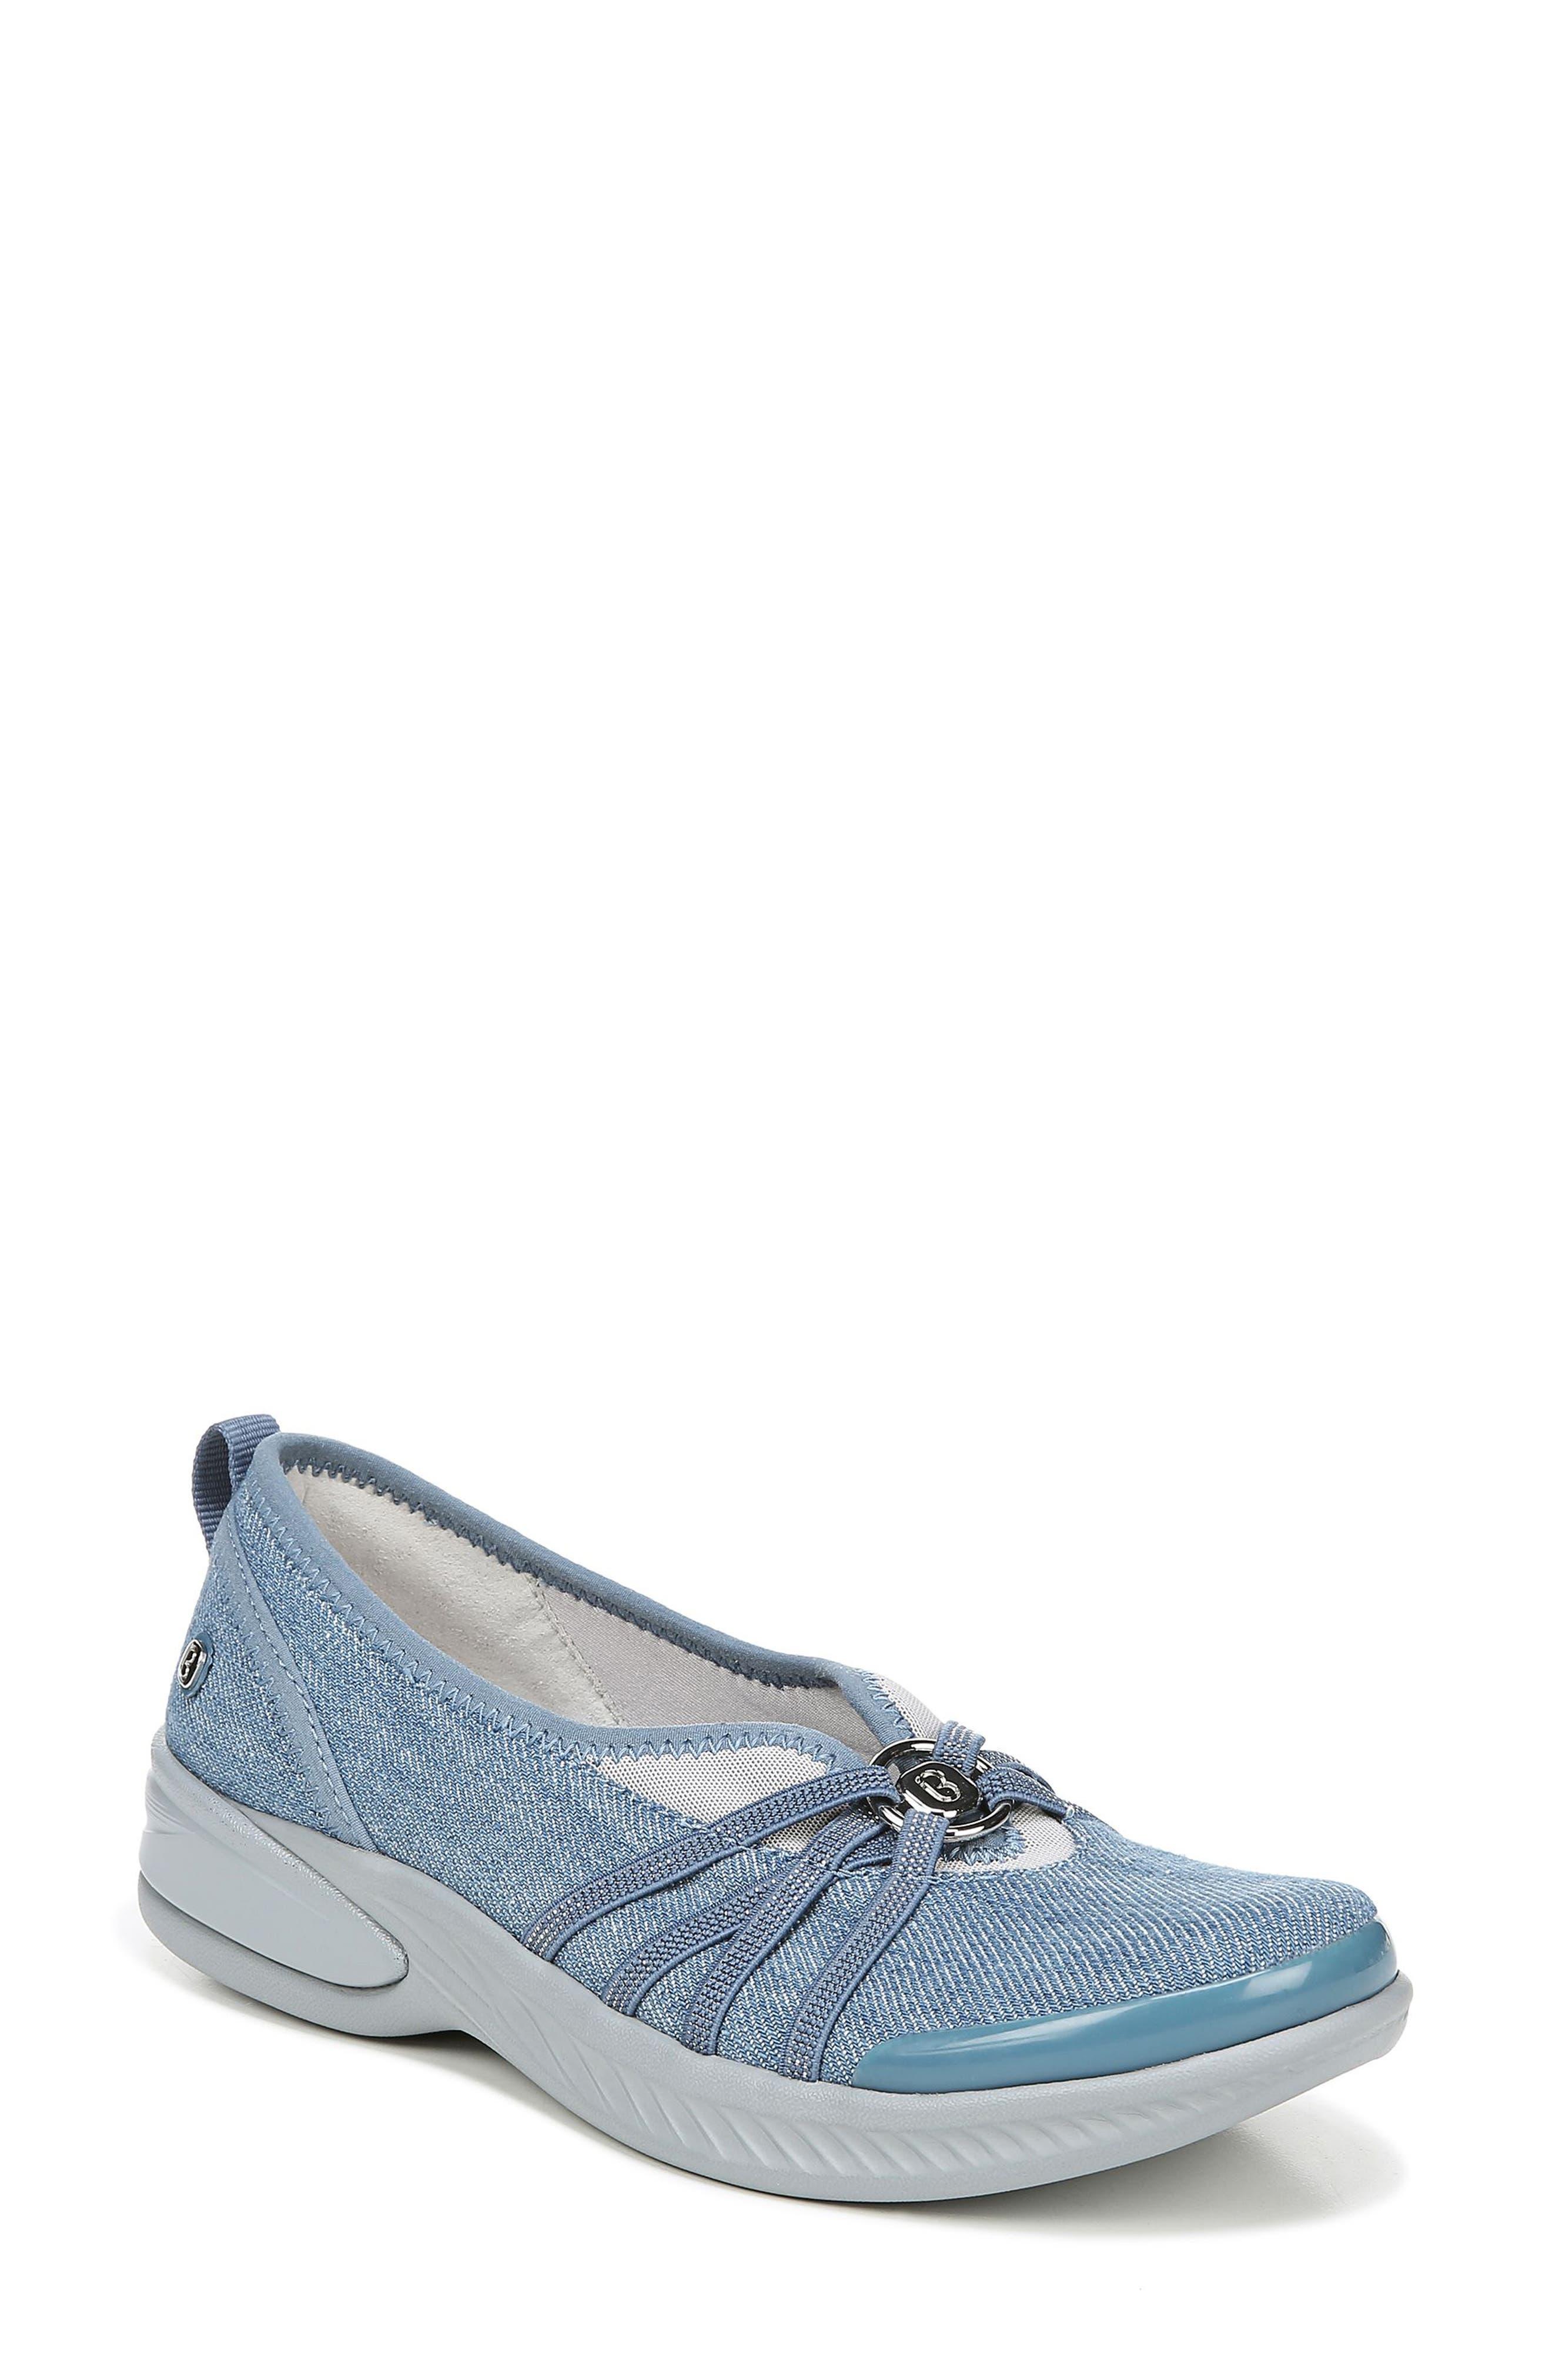 BZees Niche Slip-On Flat (Women